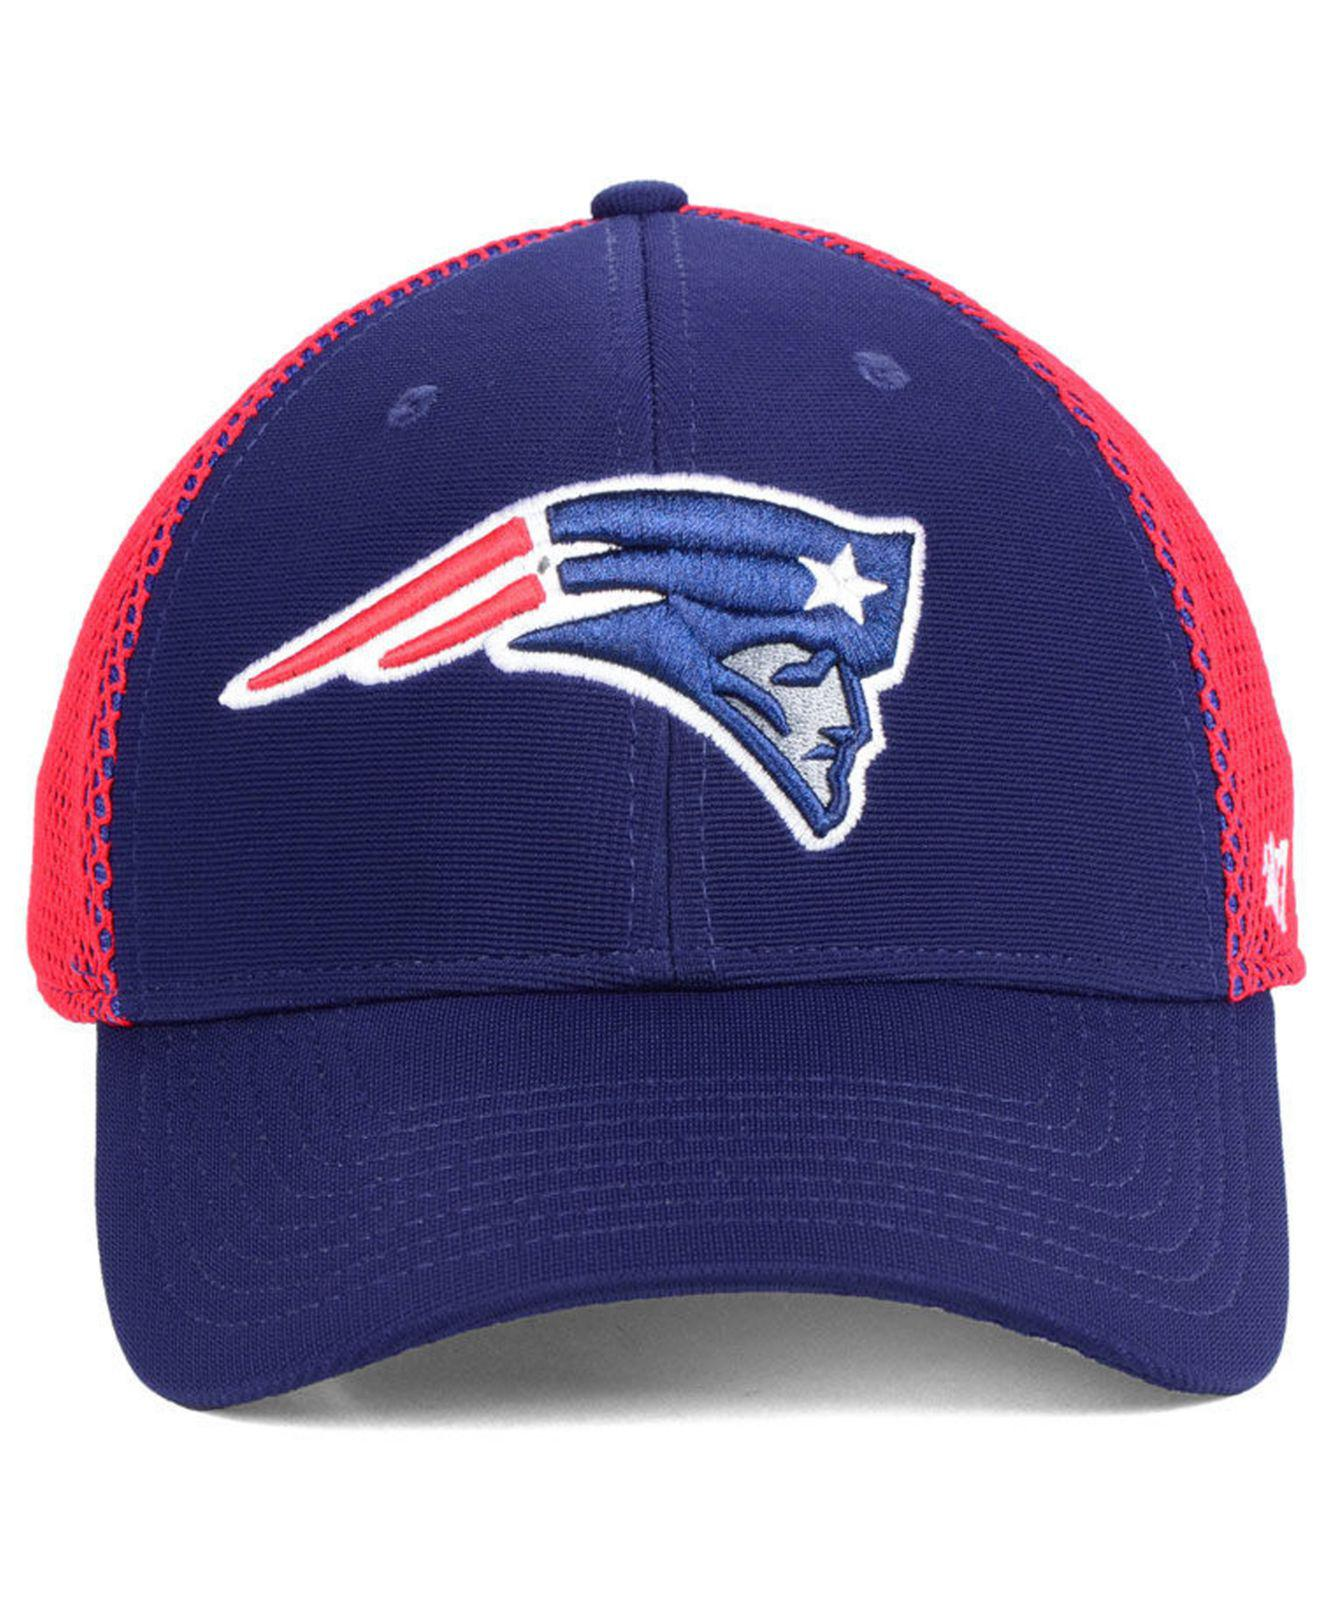 competitive price 4d662 cc885 ... closeout lyst 47 brand new england patriots comfort contender flex cap  in blue for men 93df6